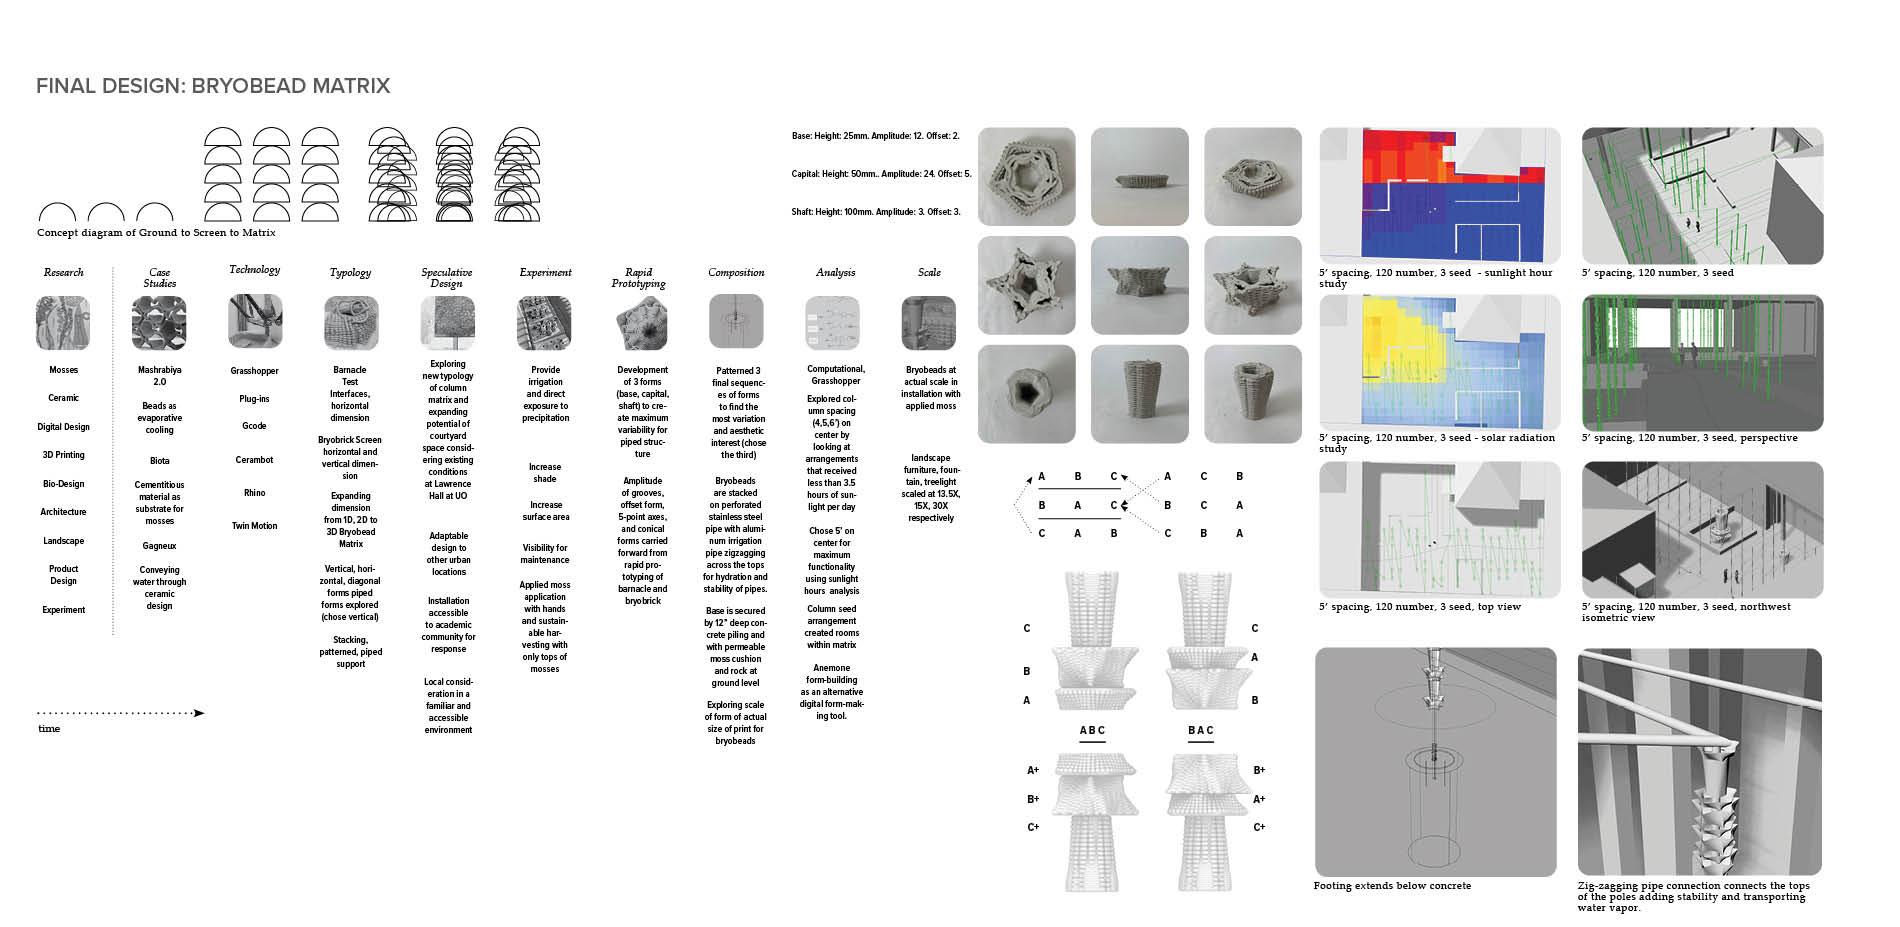 Final Design: Bryobead Matrix